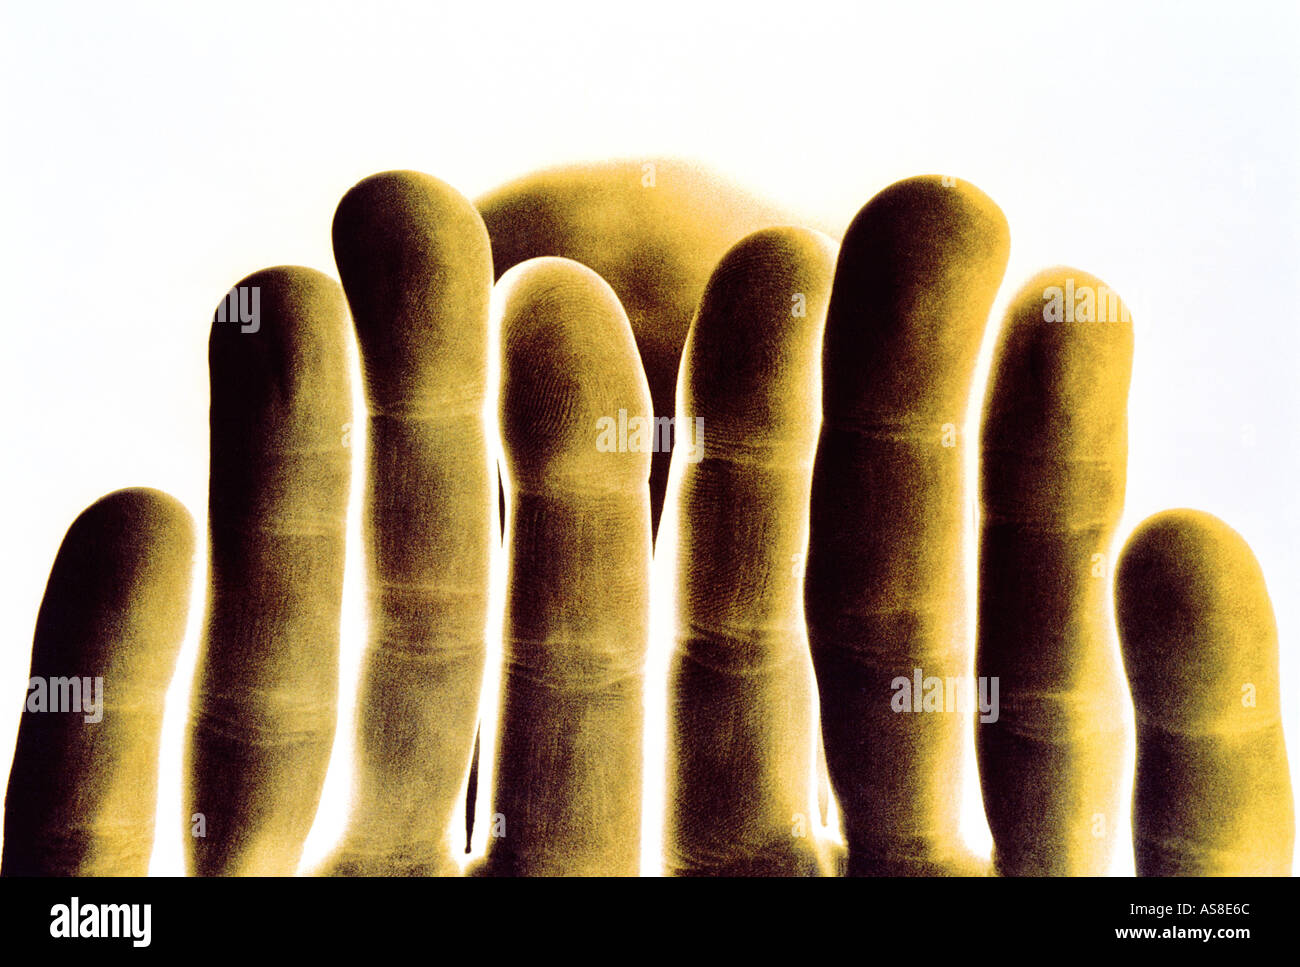 Andy s manos Imagen De Stock